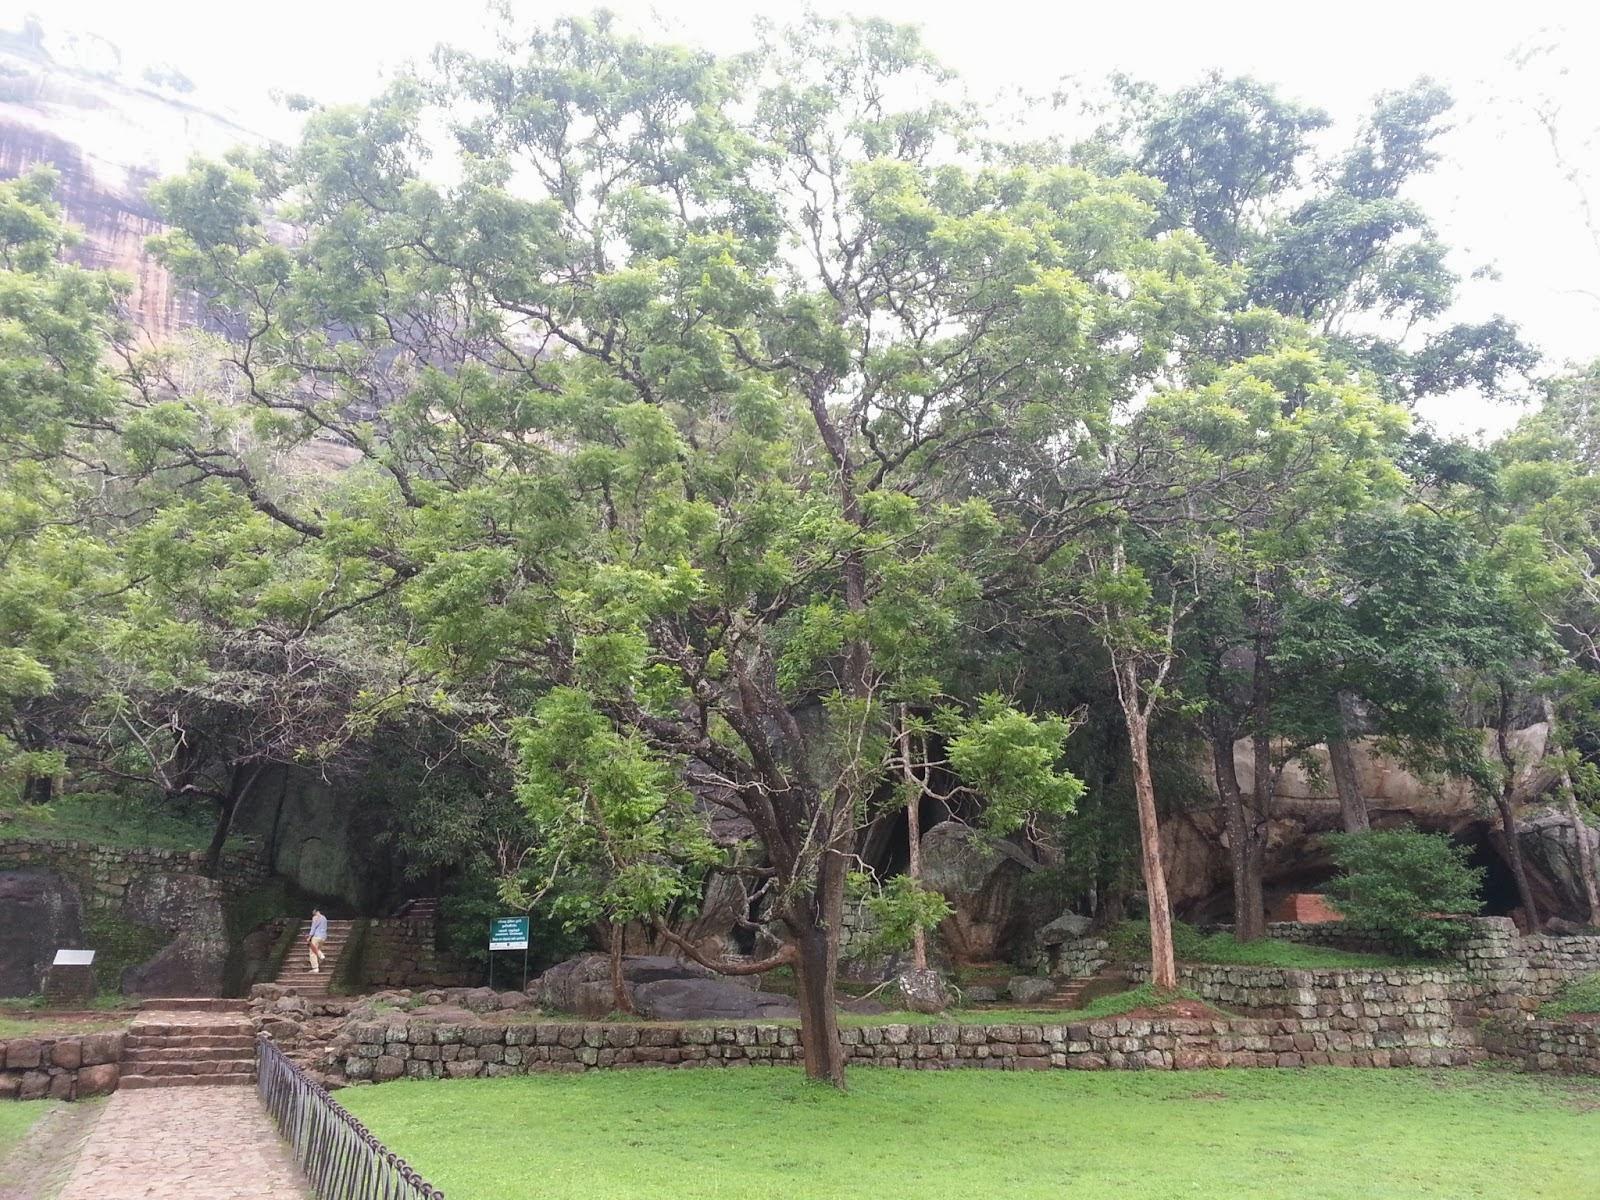 Сигирия сады на террасах, Шри-Ланка, каменная дорога, гигантские валуны, арка-вход каменная